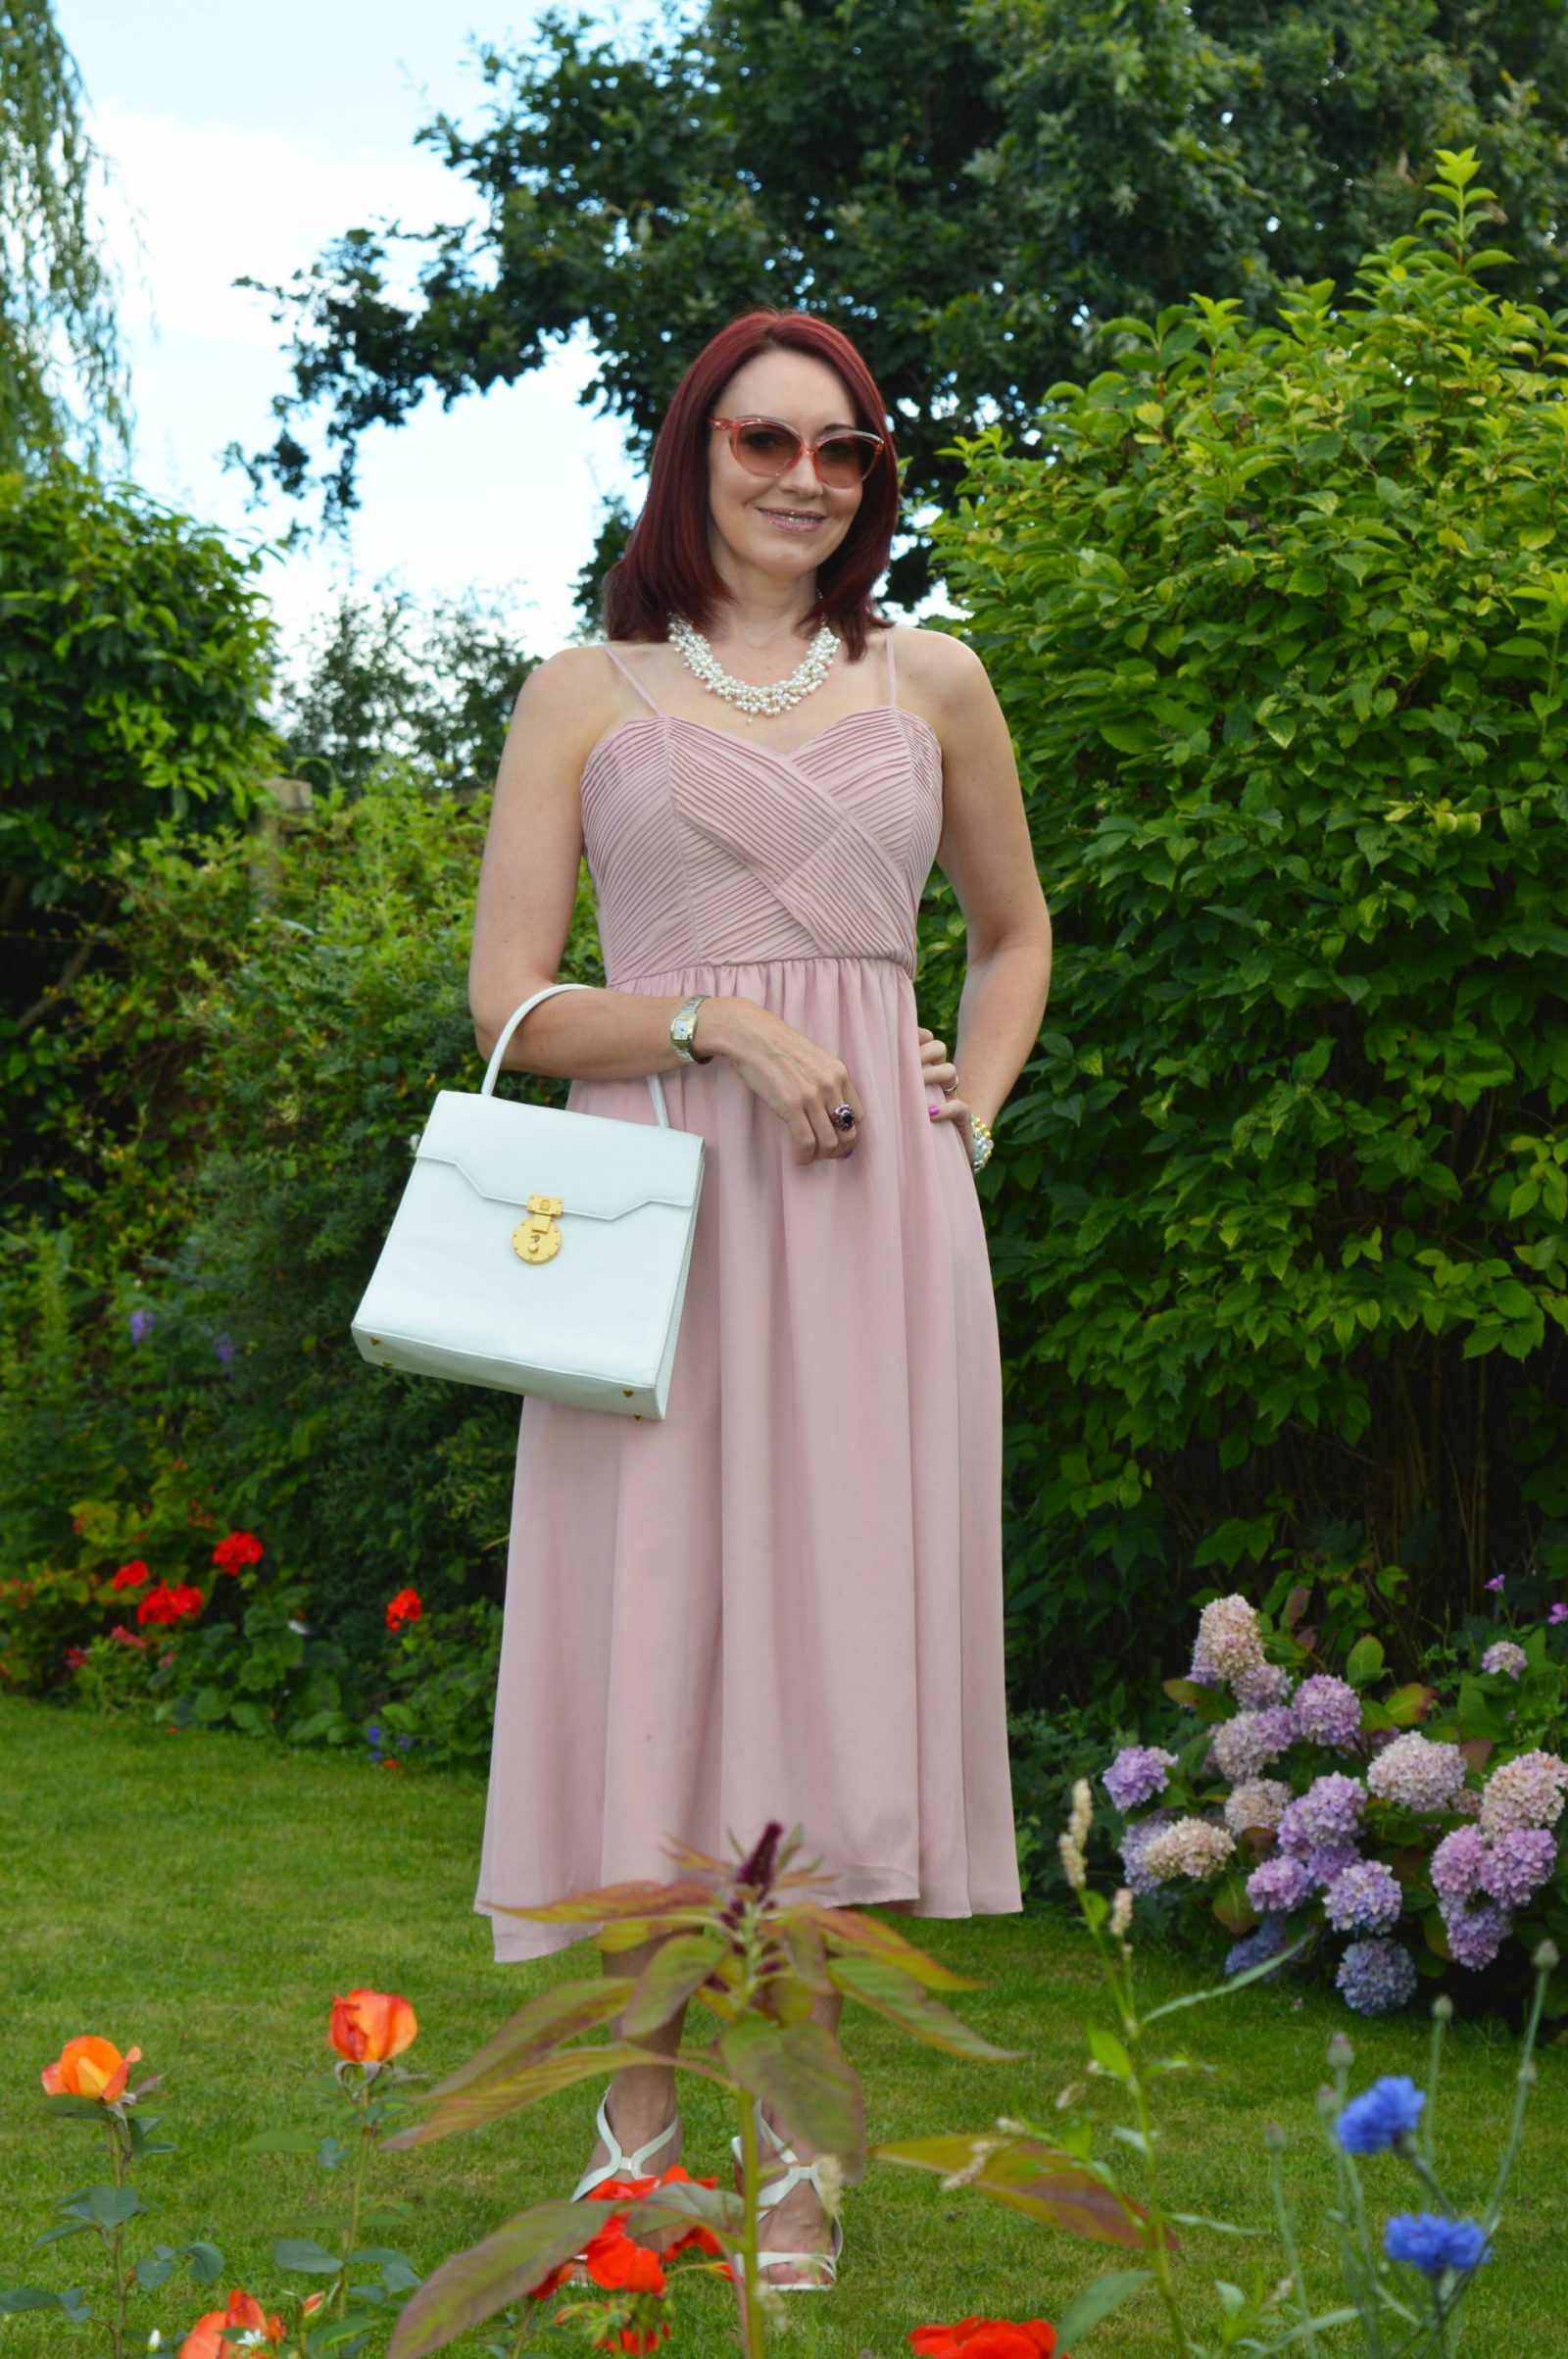 Wedding Guest Dresses From PrettyLittleThing Gracelyn dusty pink midi dress